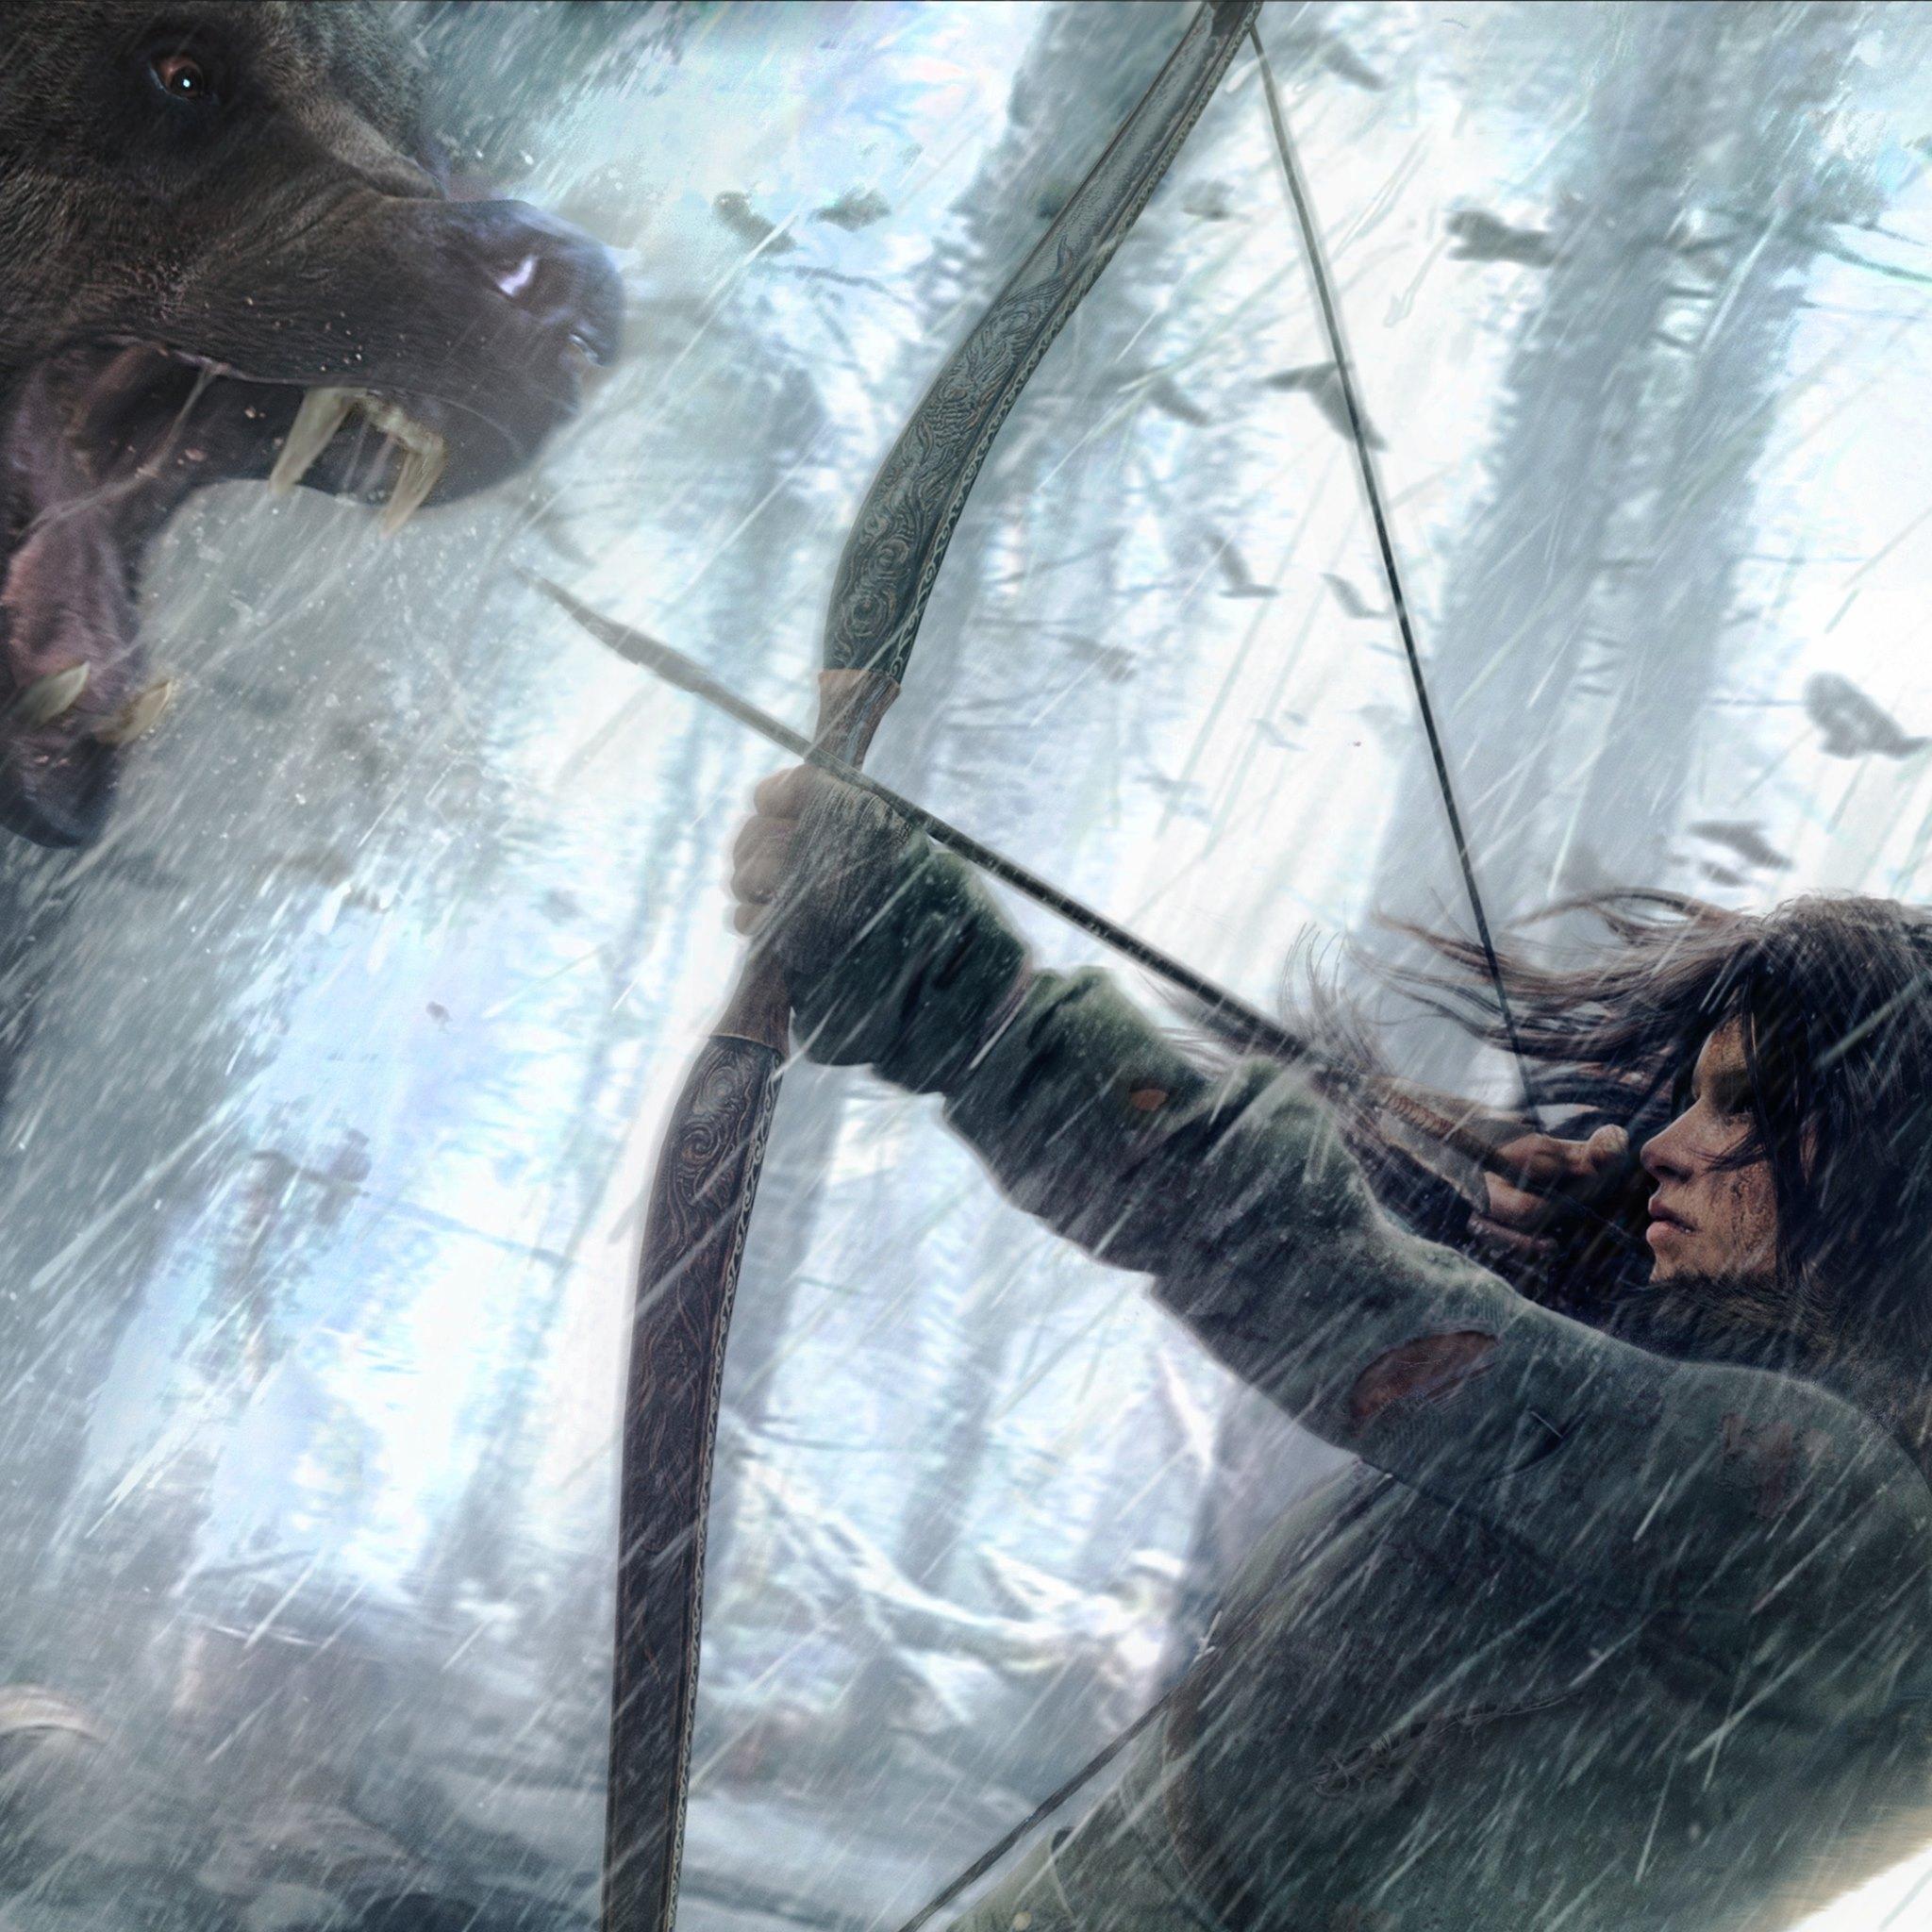 Tomb Raider Hd Wallpapers 1080p: Tomb Raider 4K Wallpaper